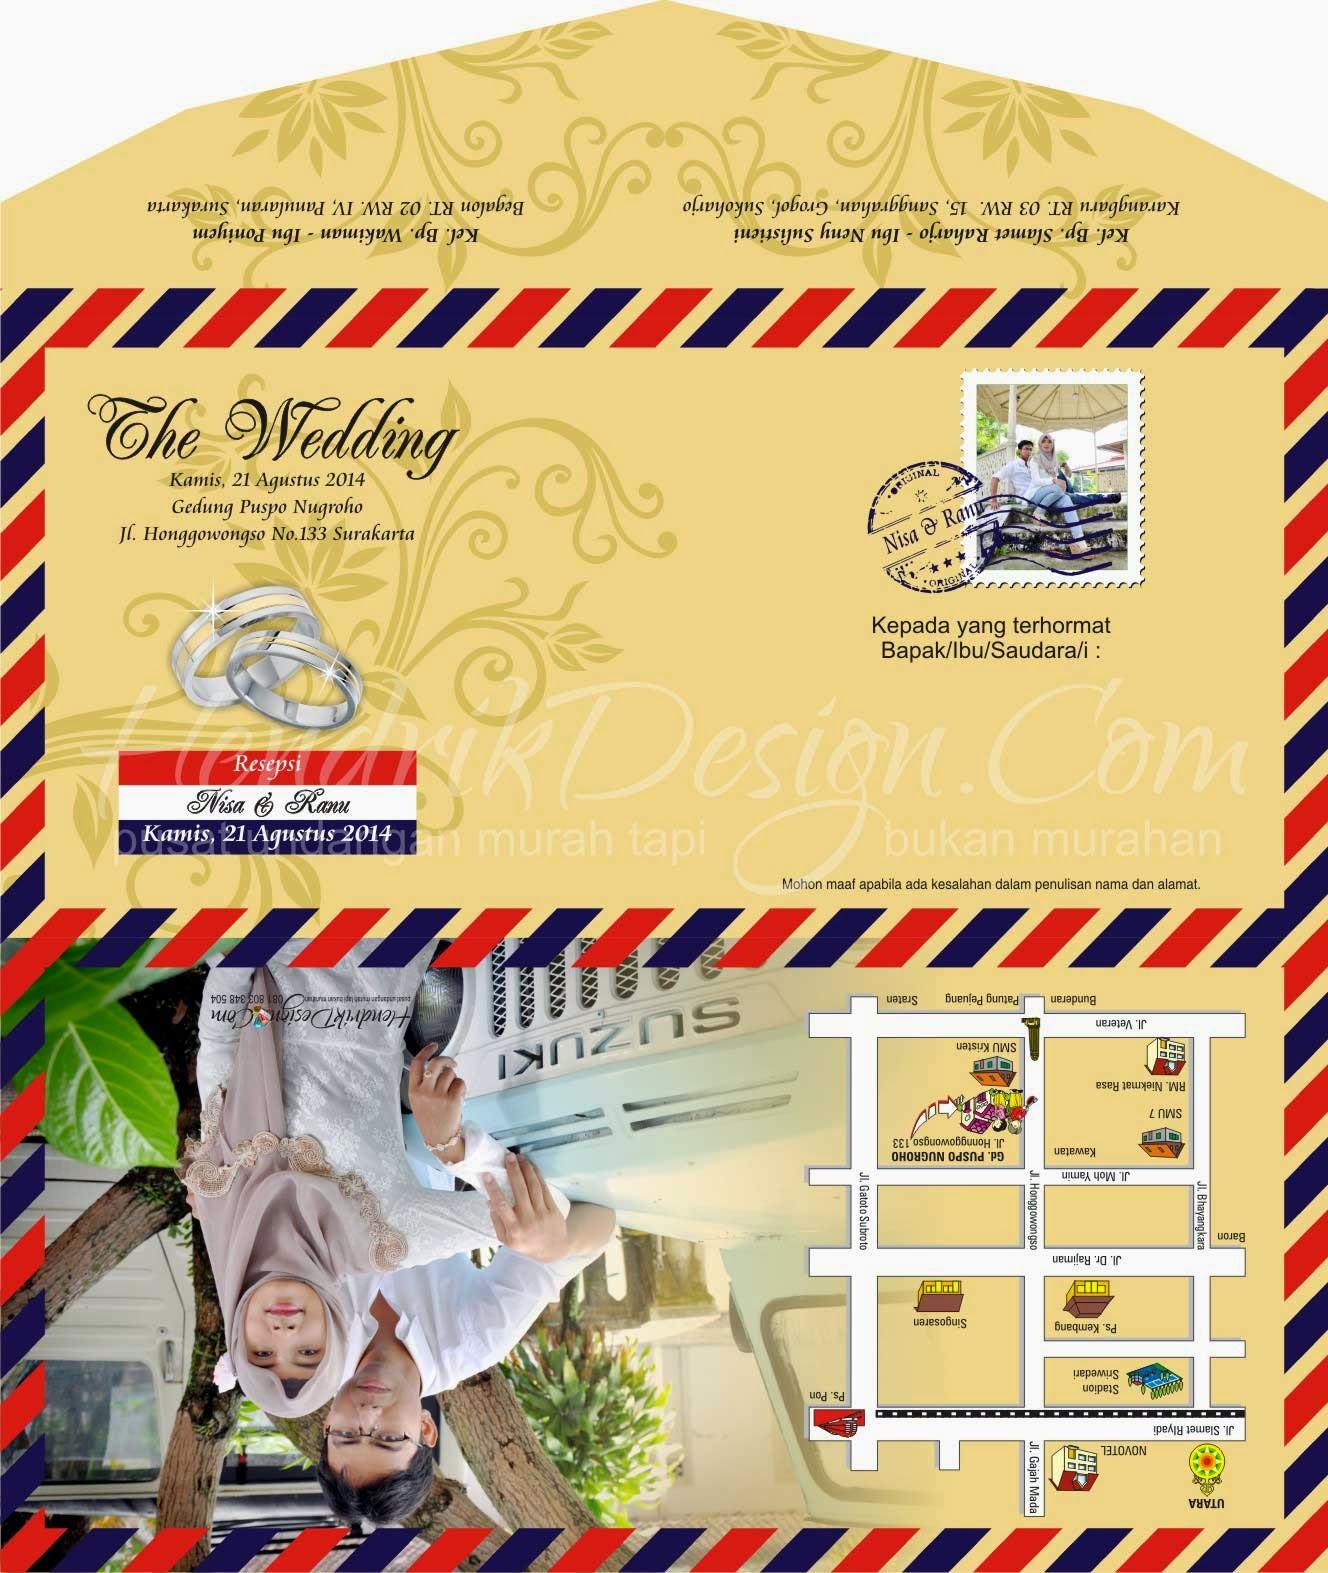 Supplier Kartu Undangan: January 2012